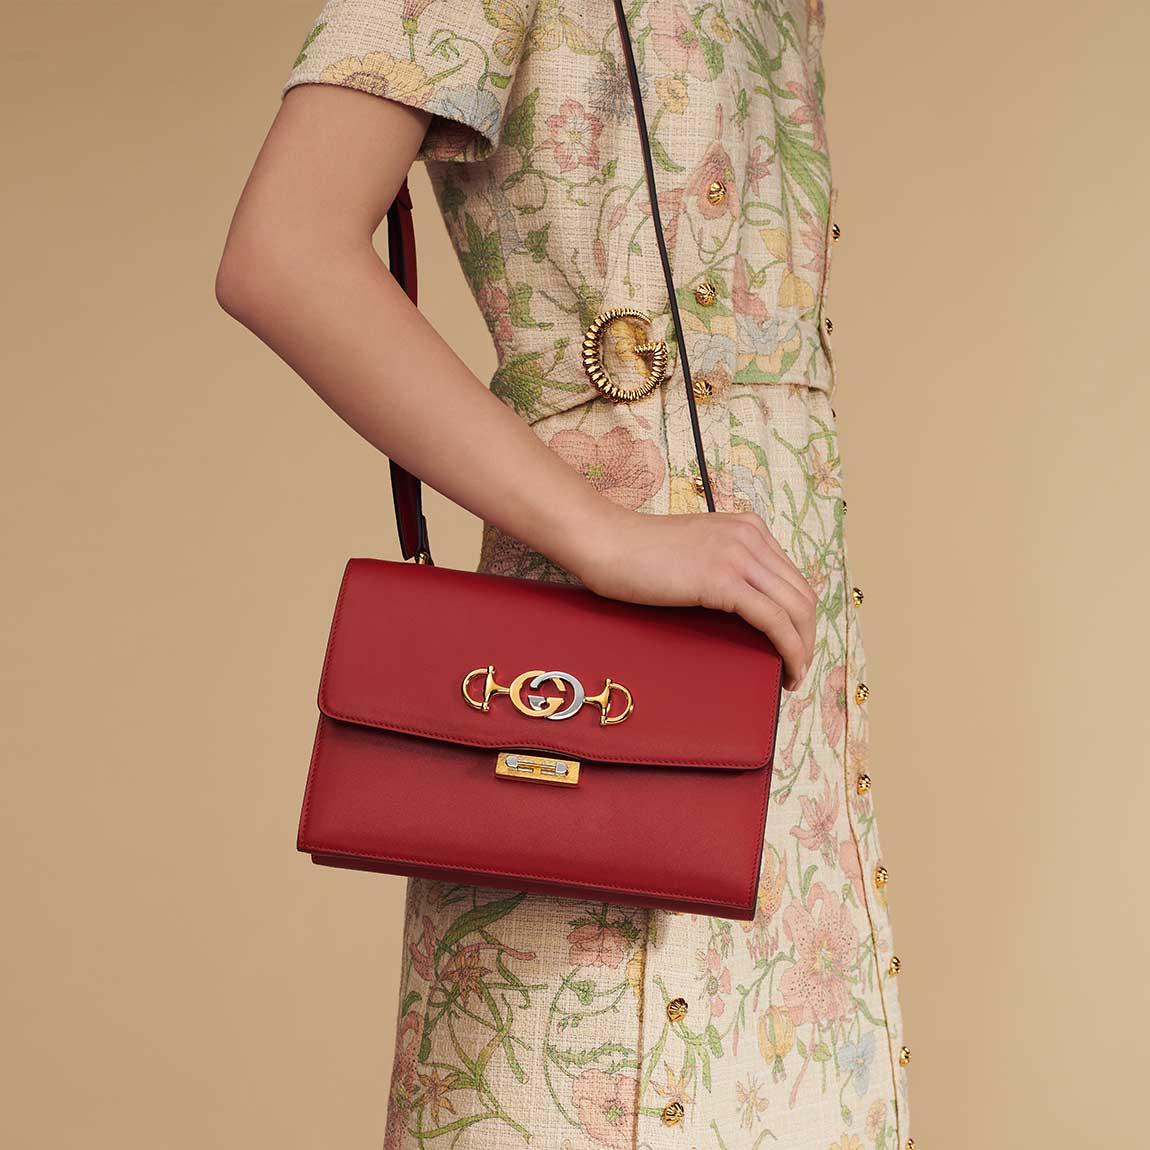 e48a31851 Prada, Jimmy Choo, Gucci, Lanvin, Dolce & Gabbana | Bergdorf Goodman